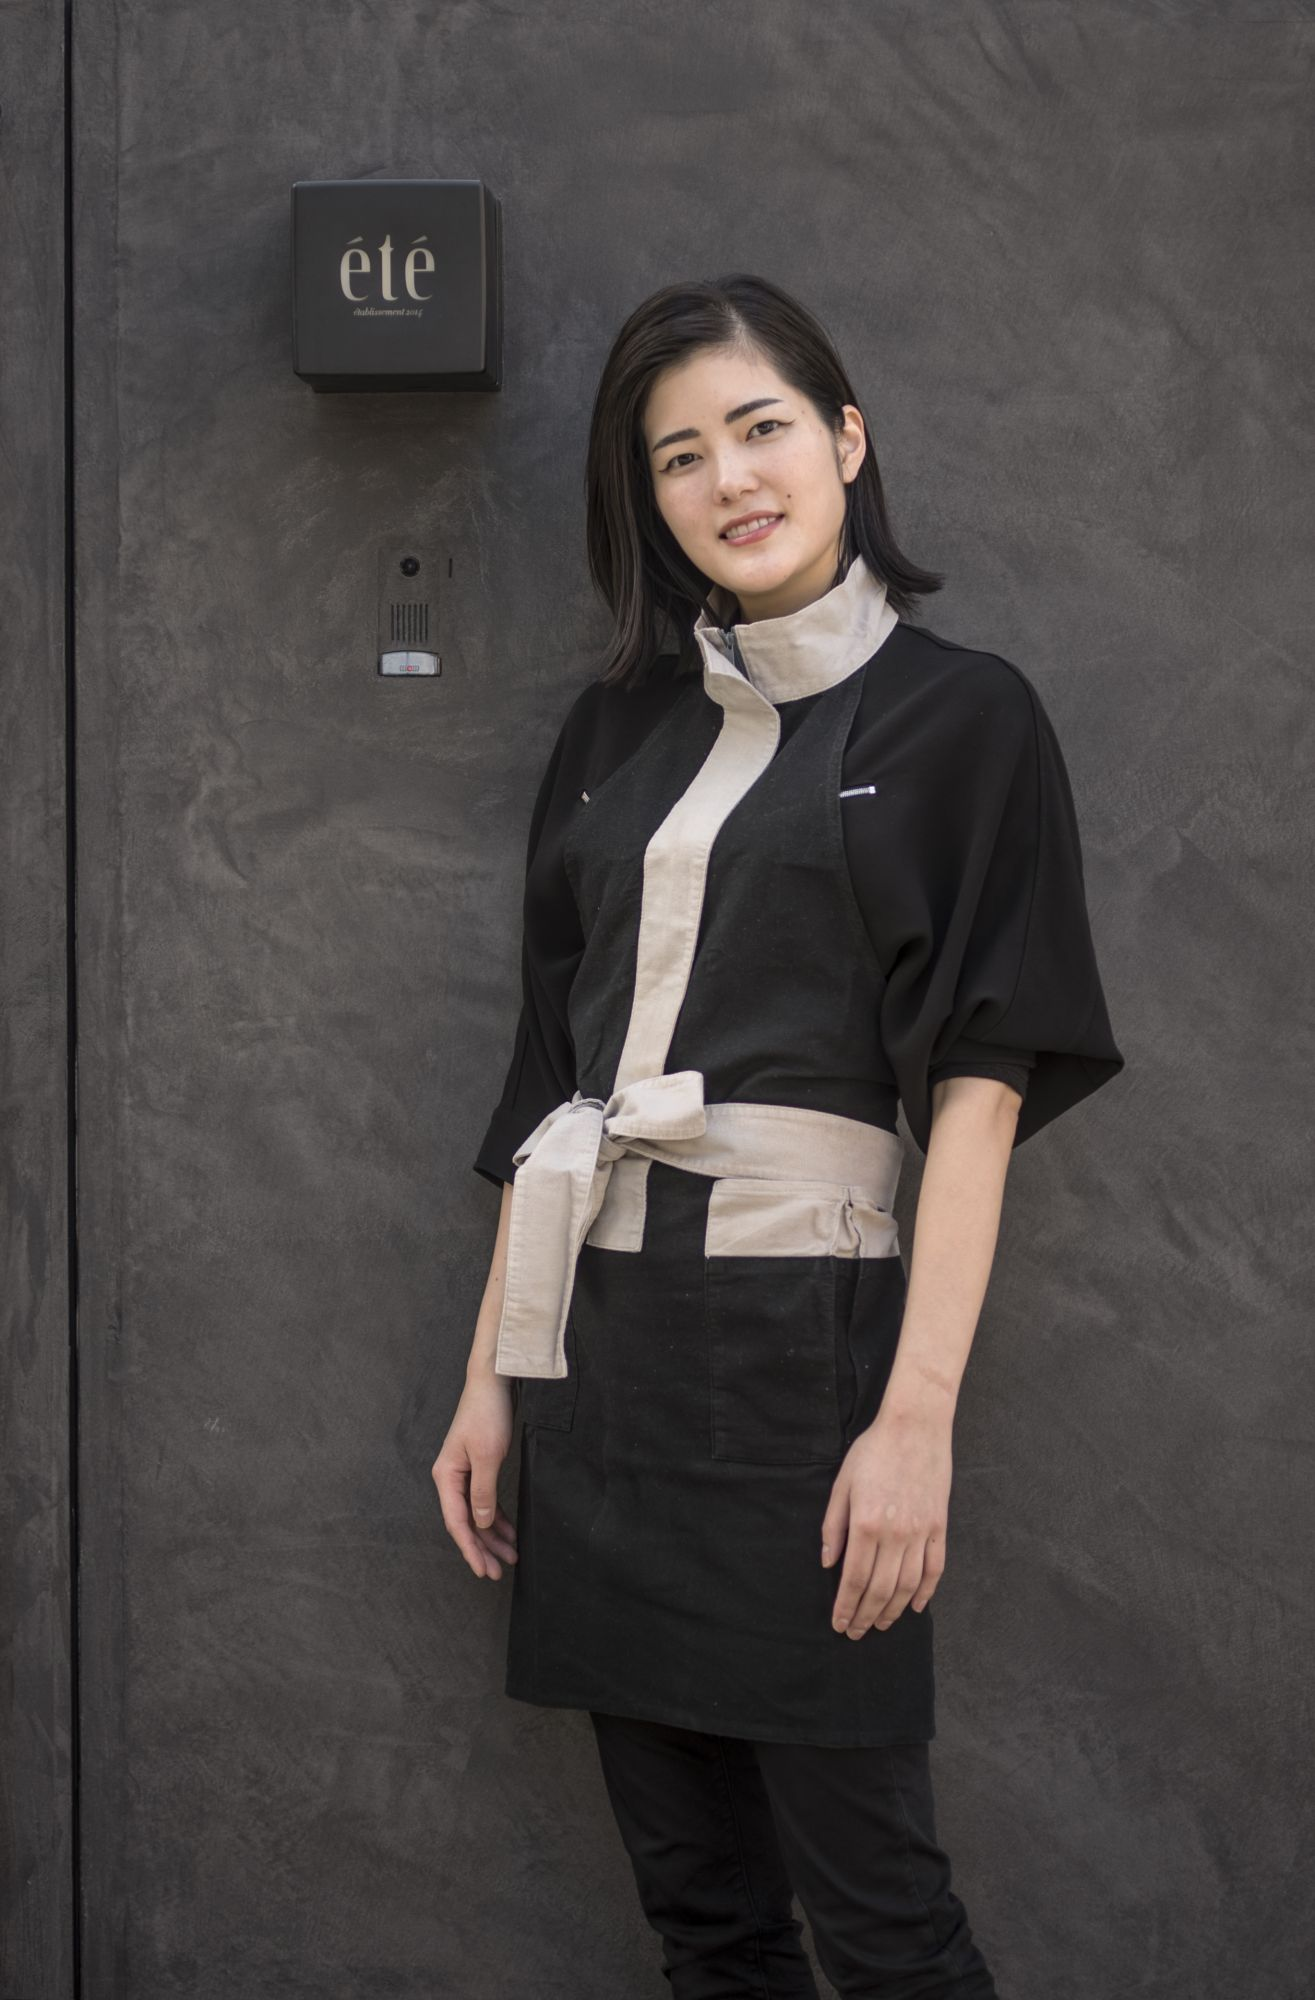 Asia's Best Pastry Chef Natsuko Shoji Has Bigger Plans For The Future